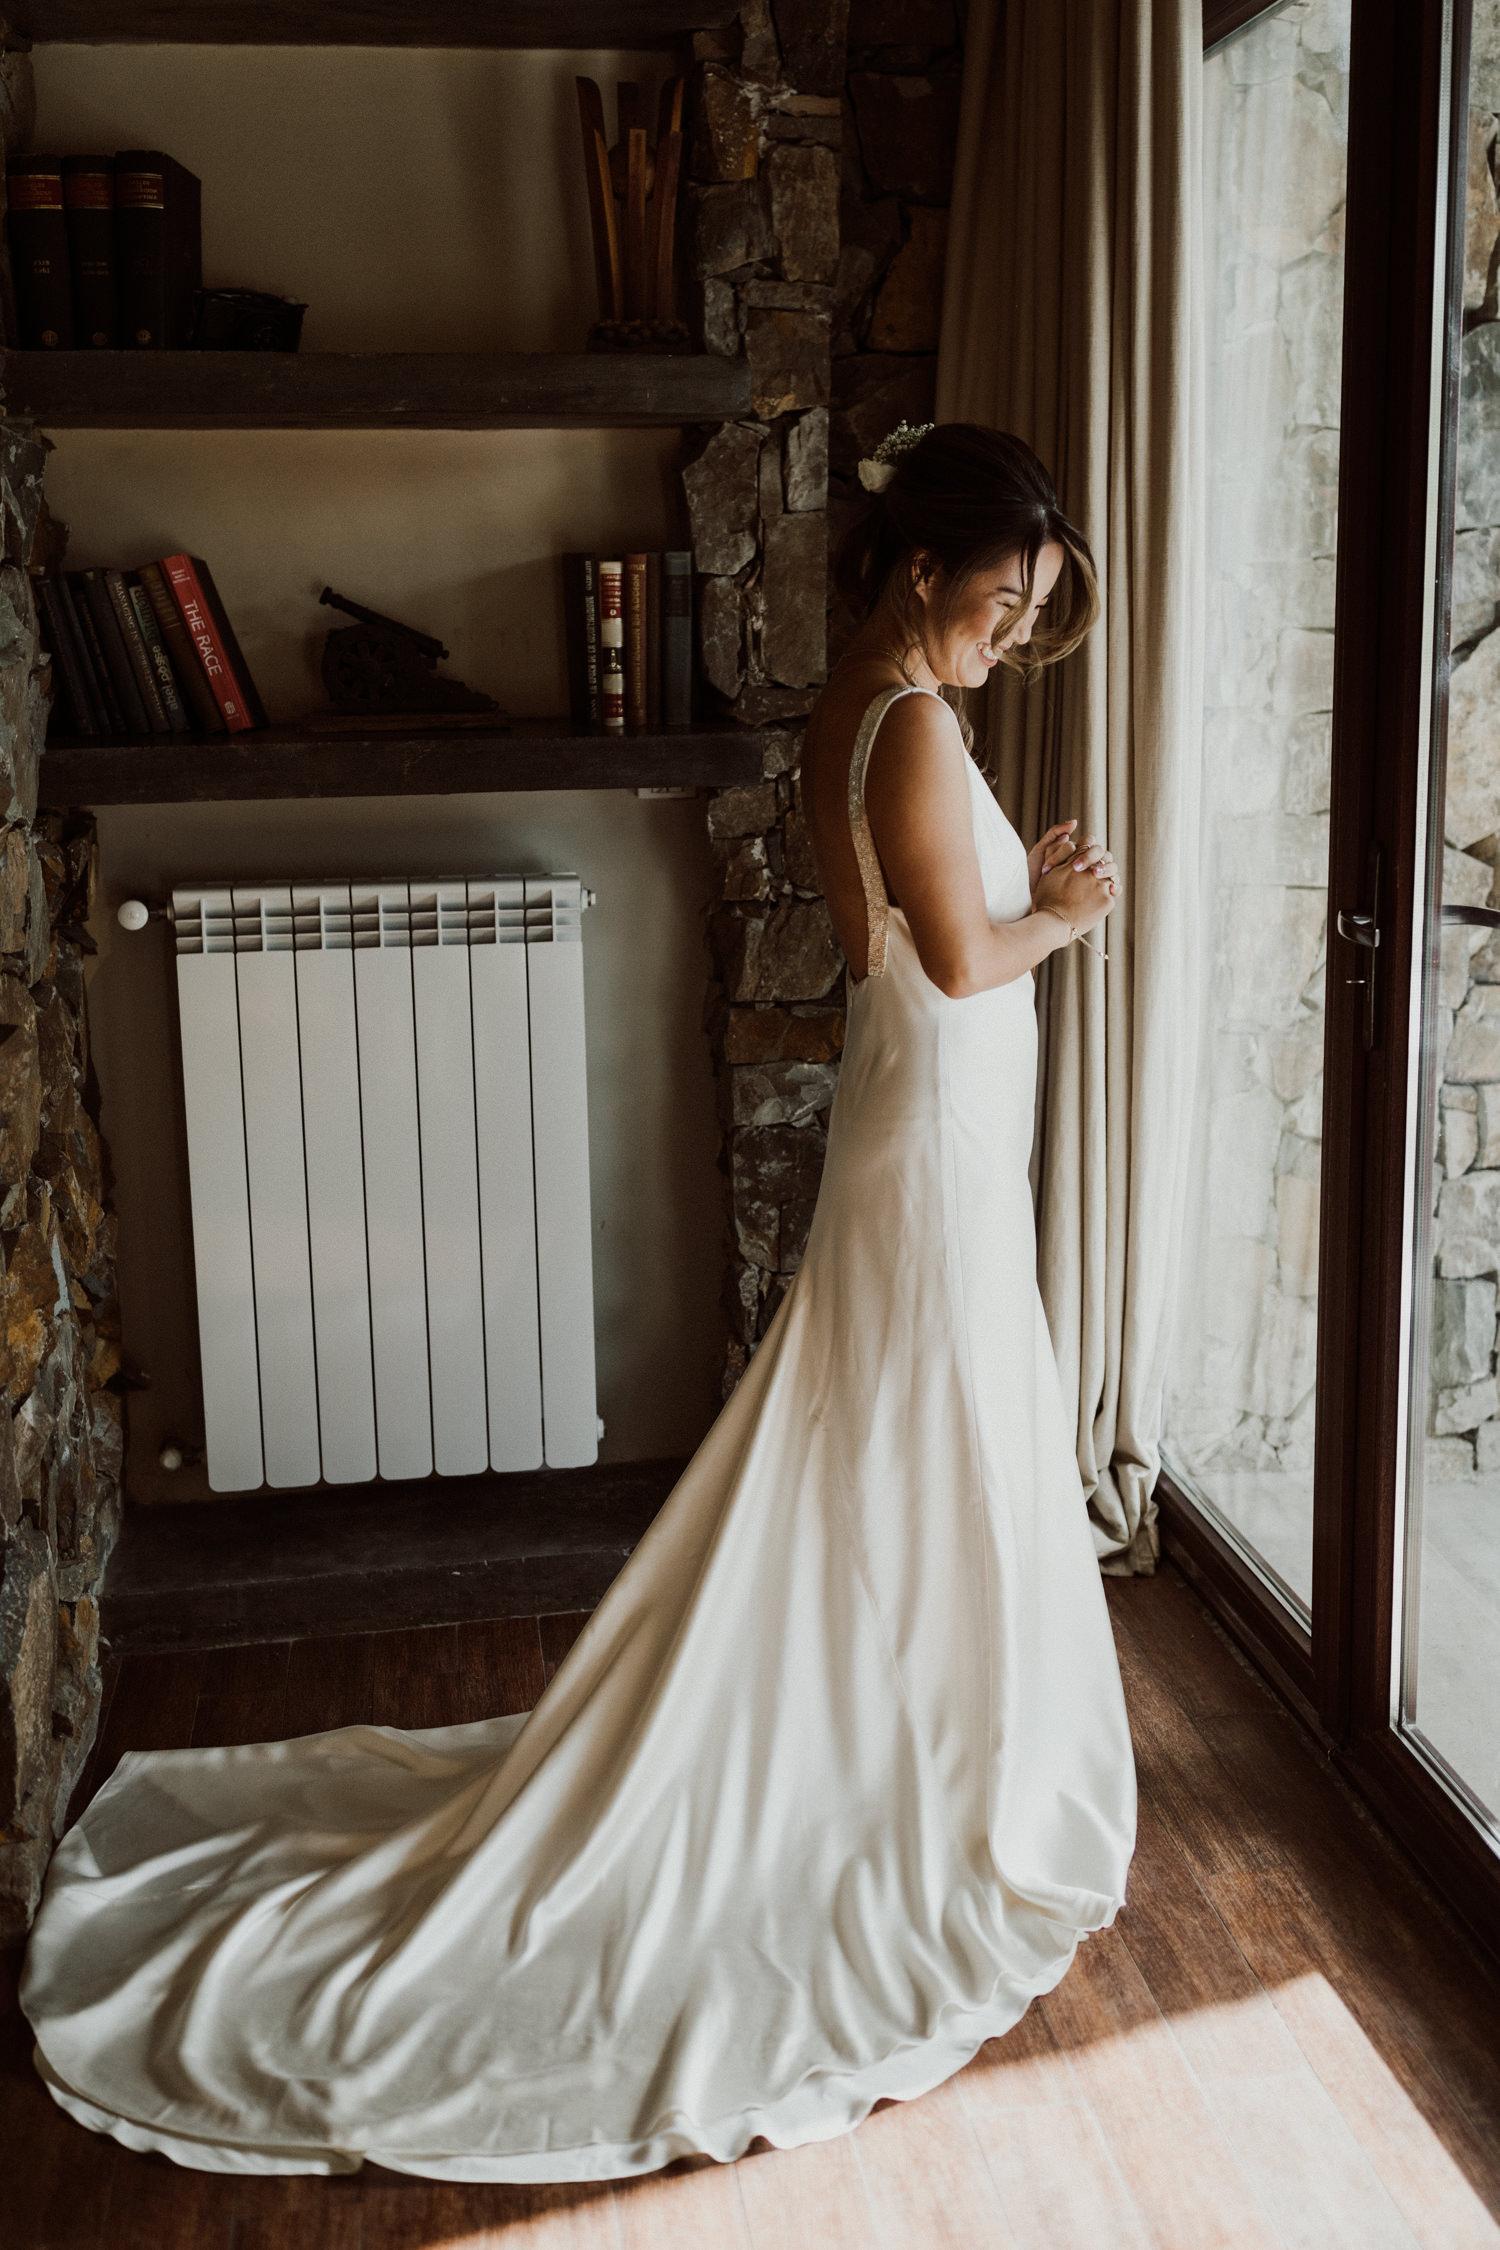 cedarandpines-kasey-erich-wedding-11.jpg